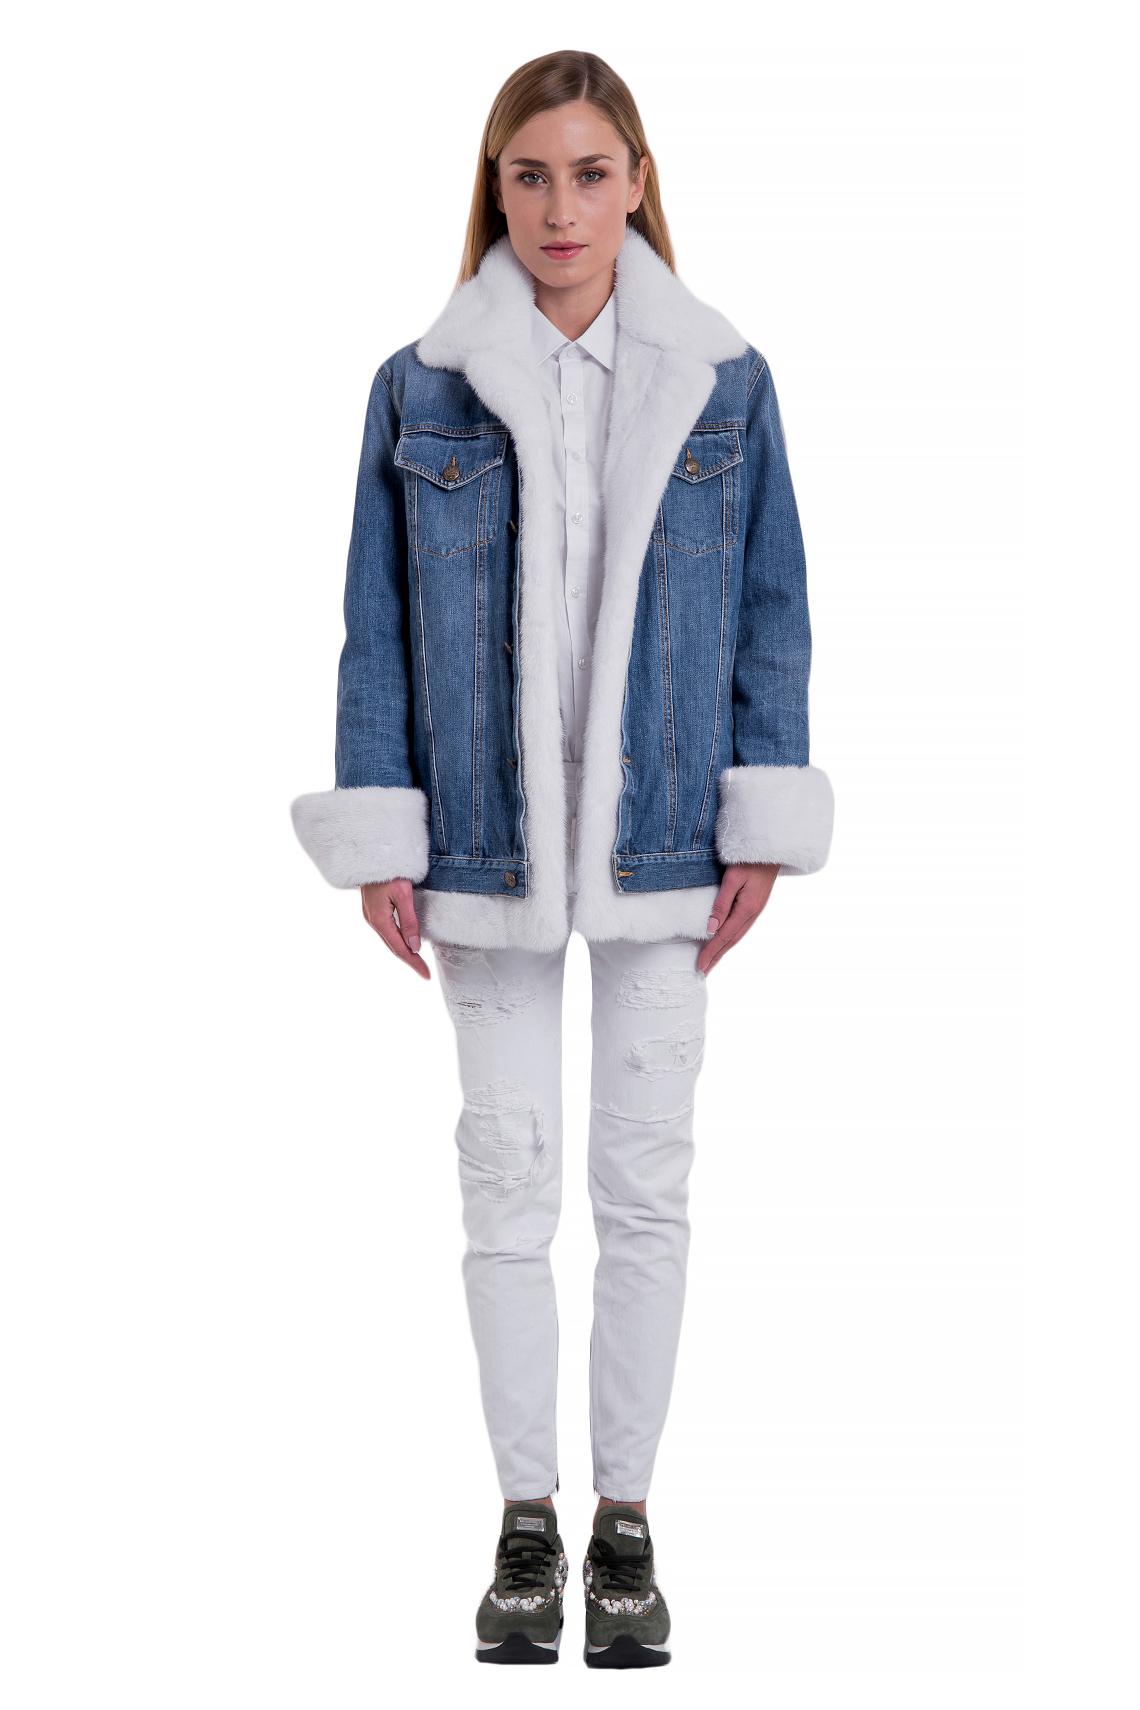 Джинсовая куртка Nello Santi норка Арт 103. Фото 1